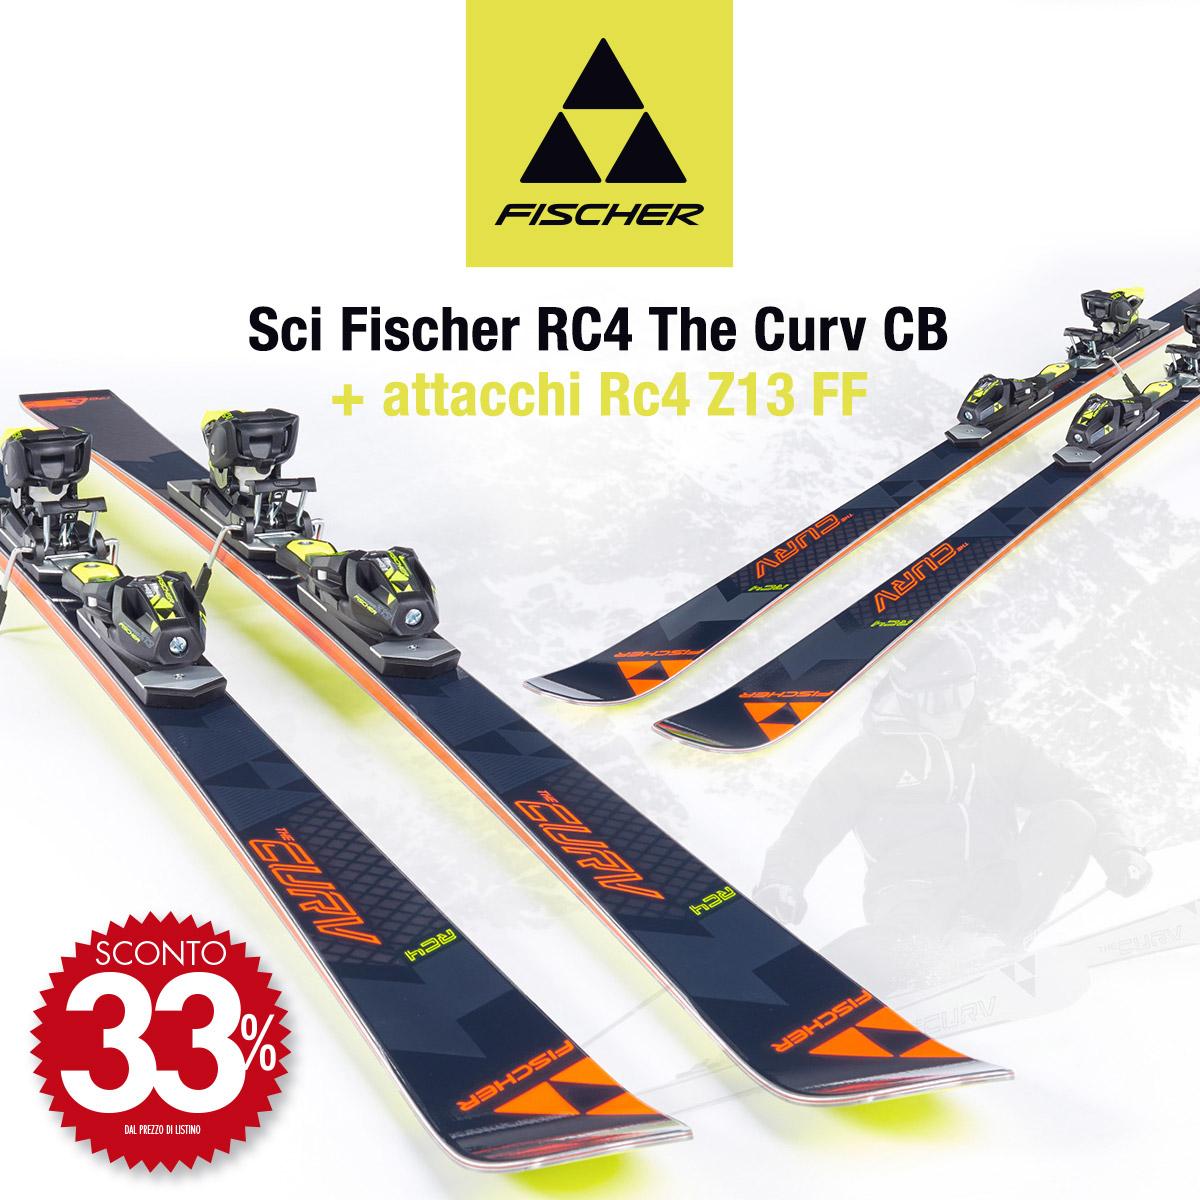 Fischer RC4 The Curv CB: adrenalina pura per sciatori senza compromessi